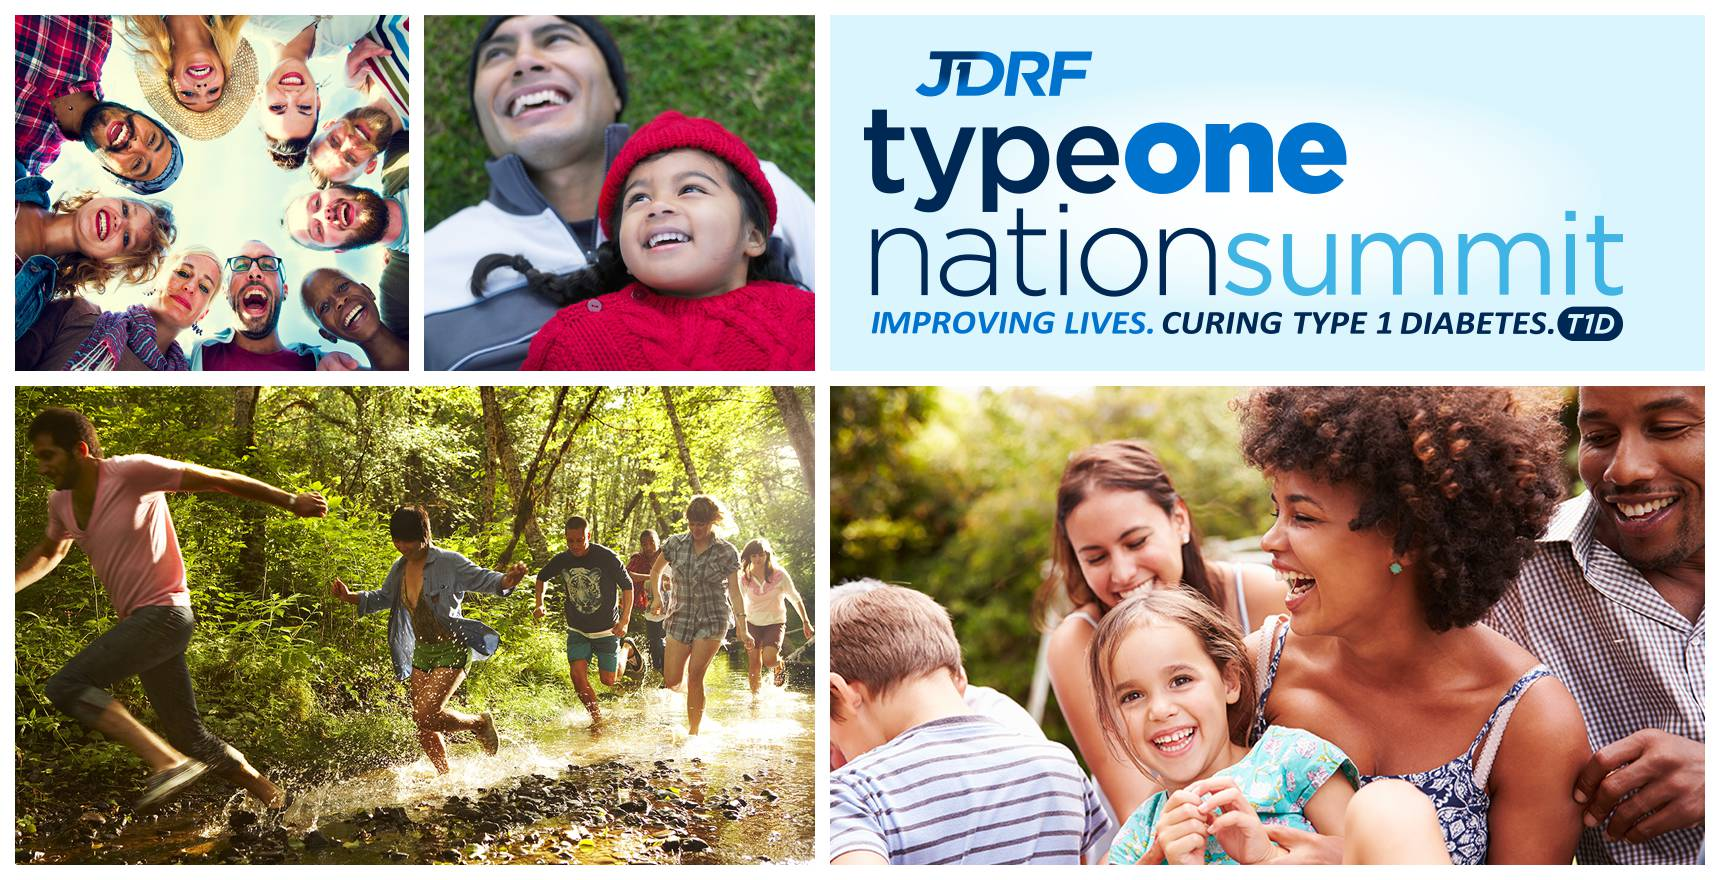 jdrf typeonenation summit salt lake city utah the mindfuldiabetic